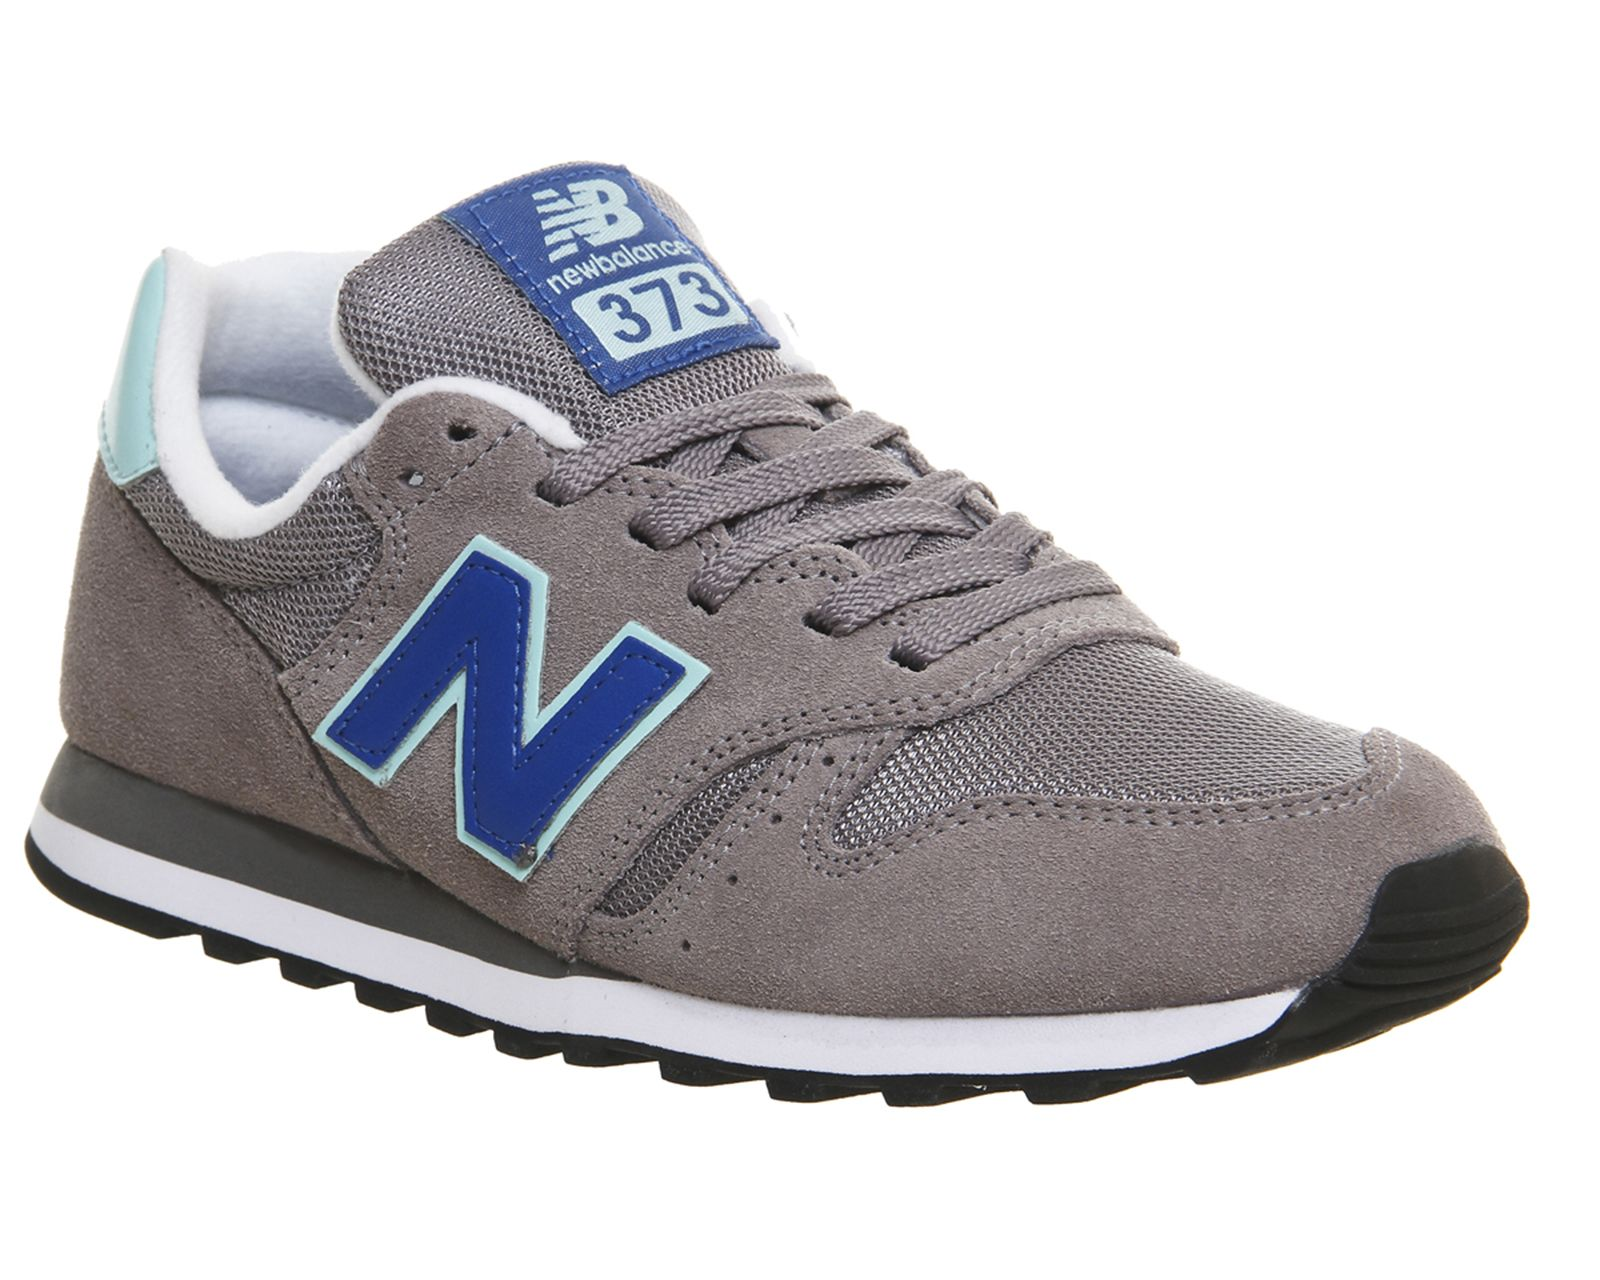 New Balance Ml373 Grey Mint Blue